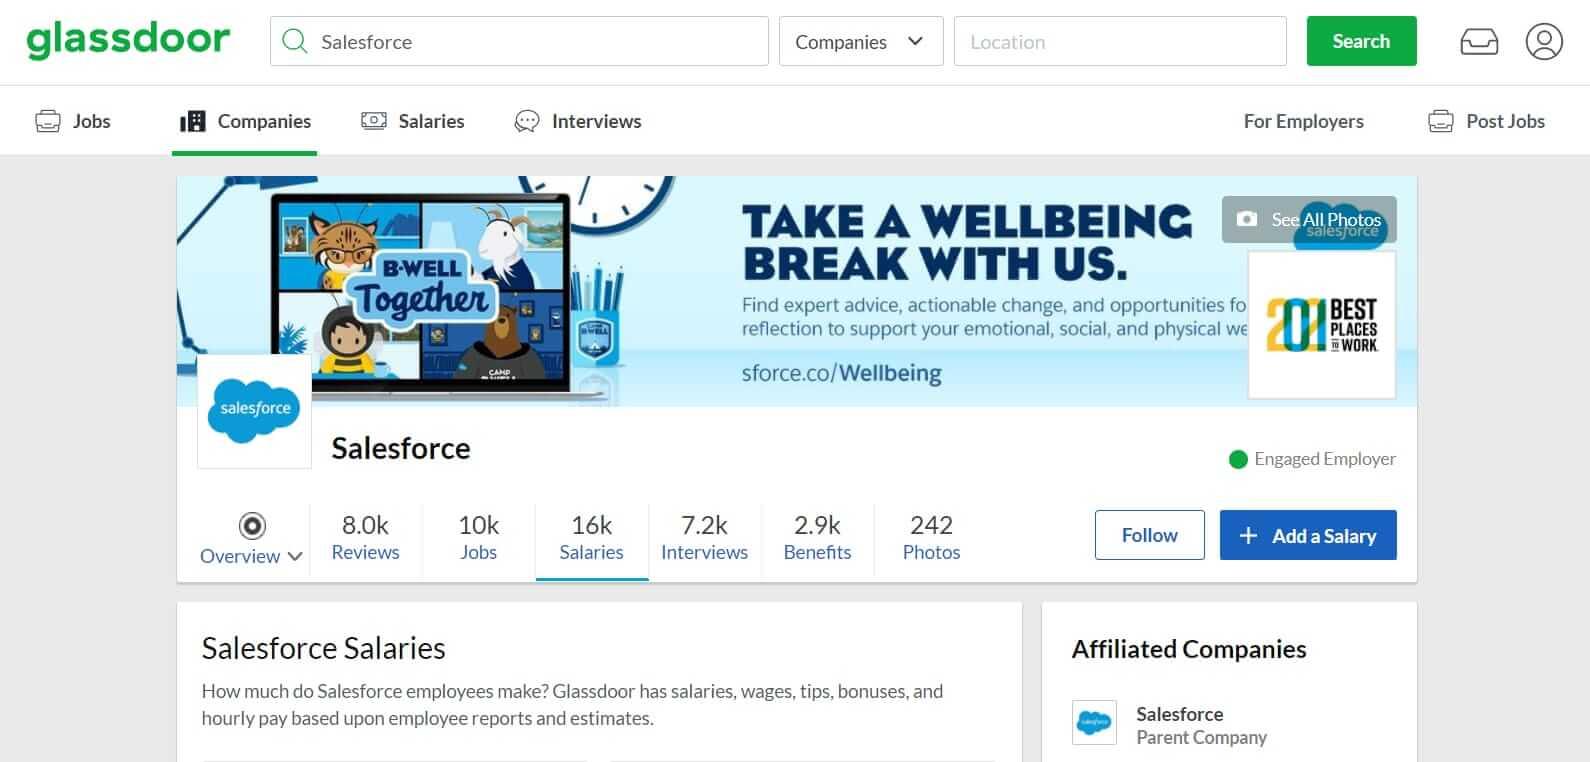 Salesforce profile on Glassdoor com